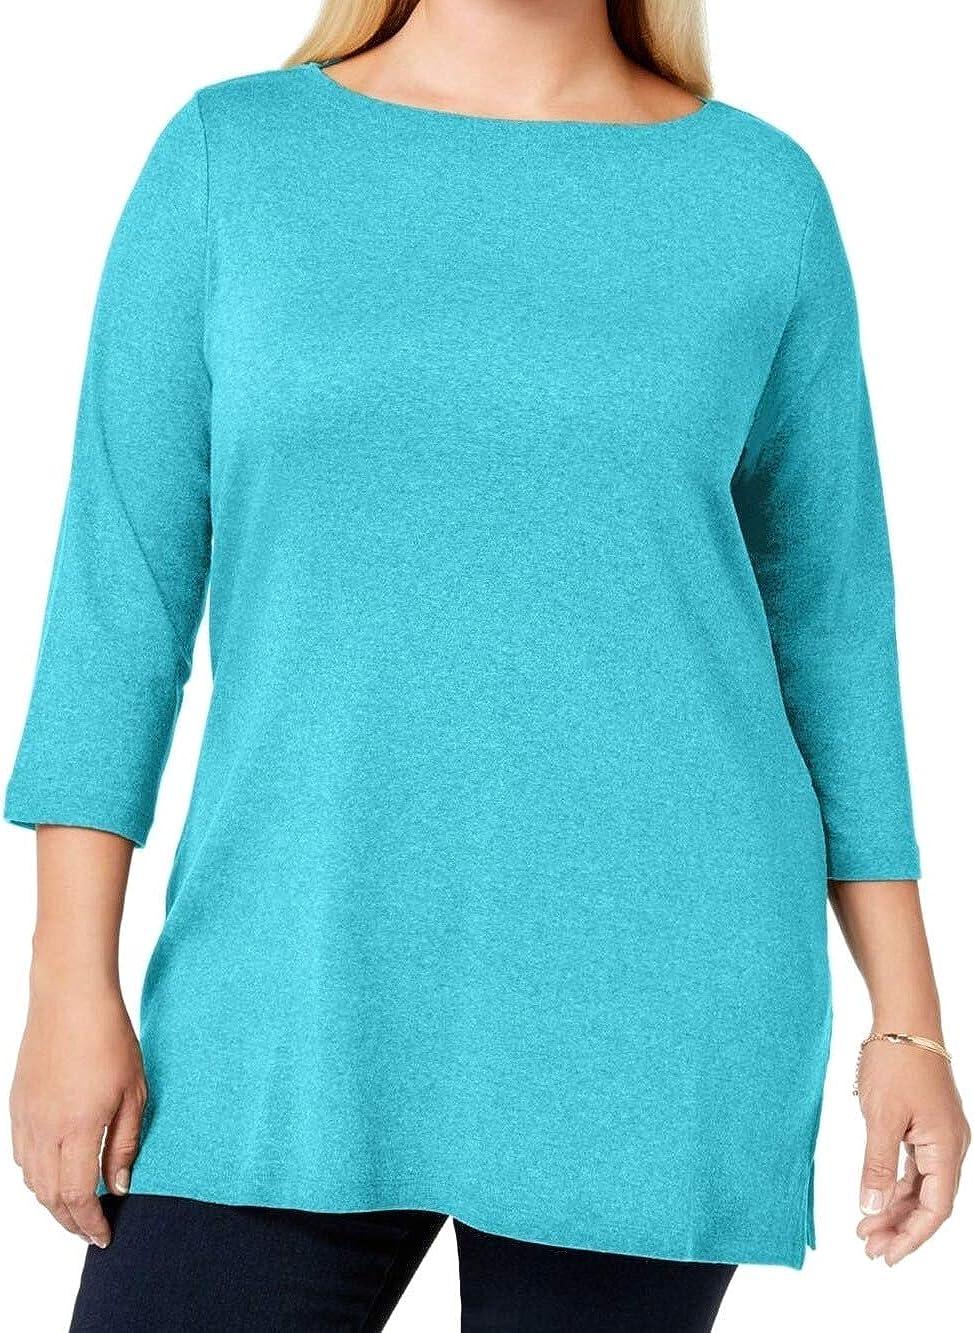 Karen Scott Womens Plus Cotton Boatneck Top